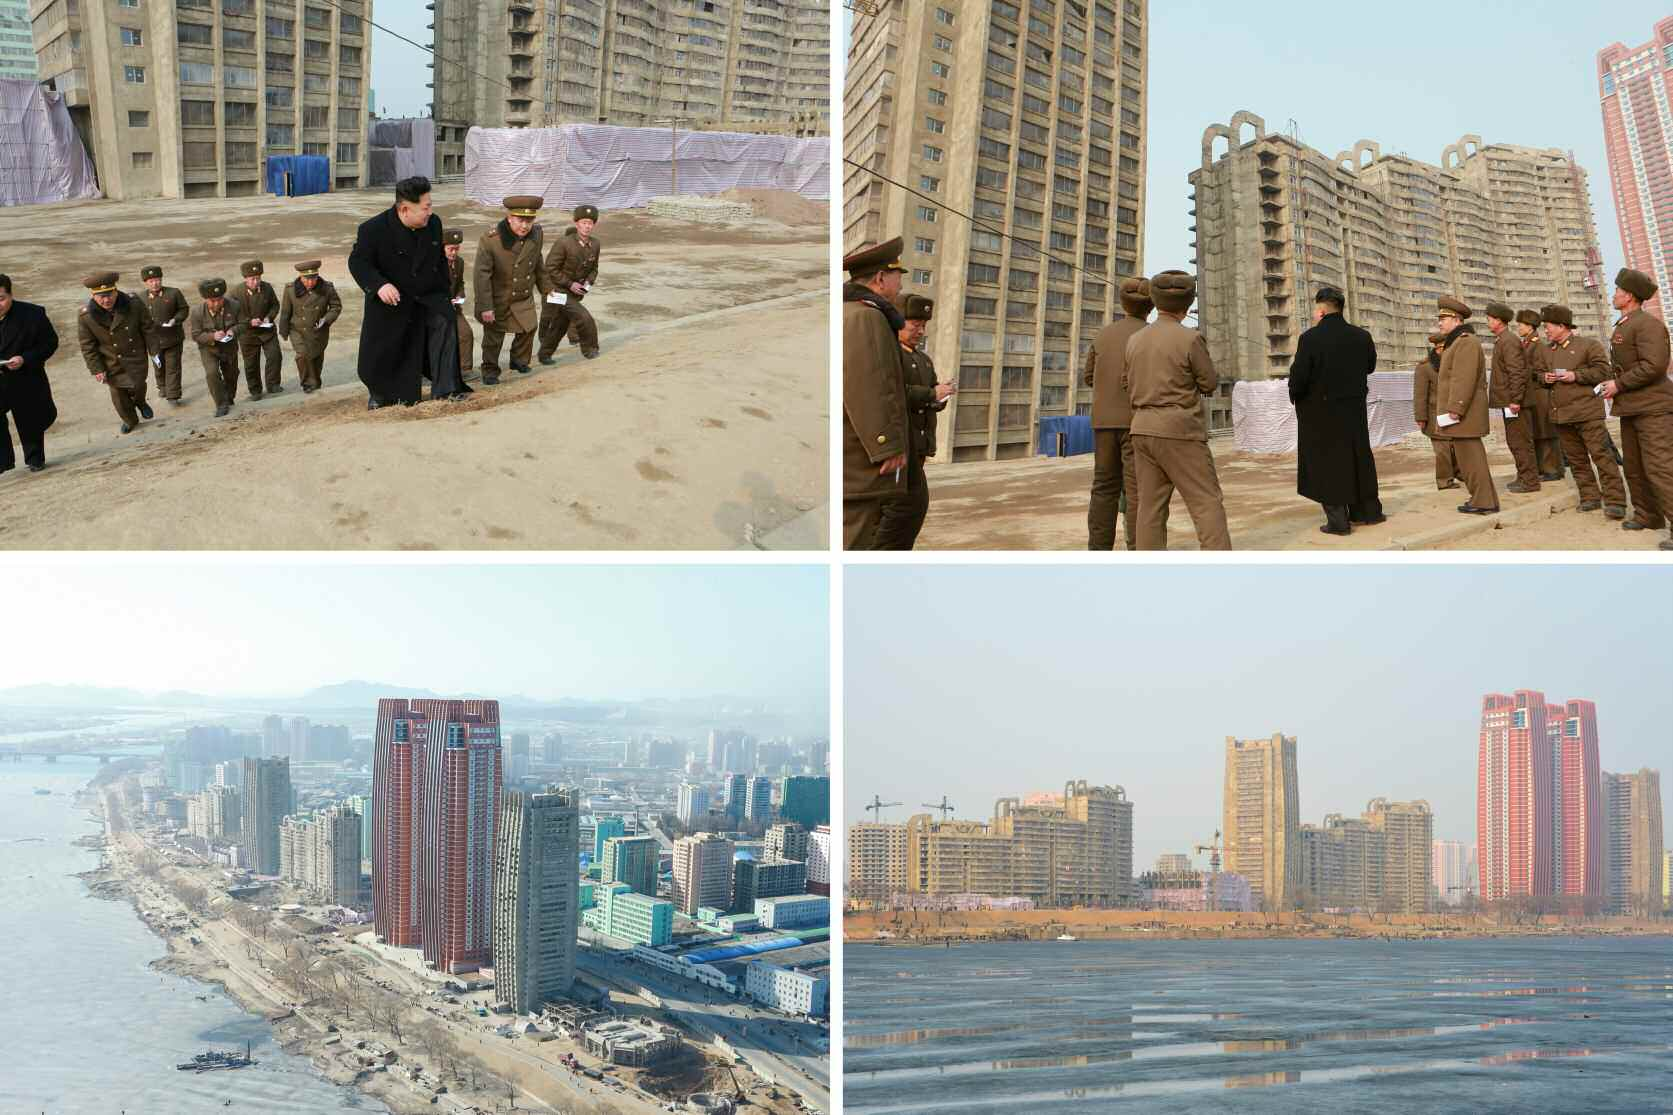 http://jahannews.com/images/docs/000407/n00407604-s.jpg